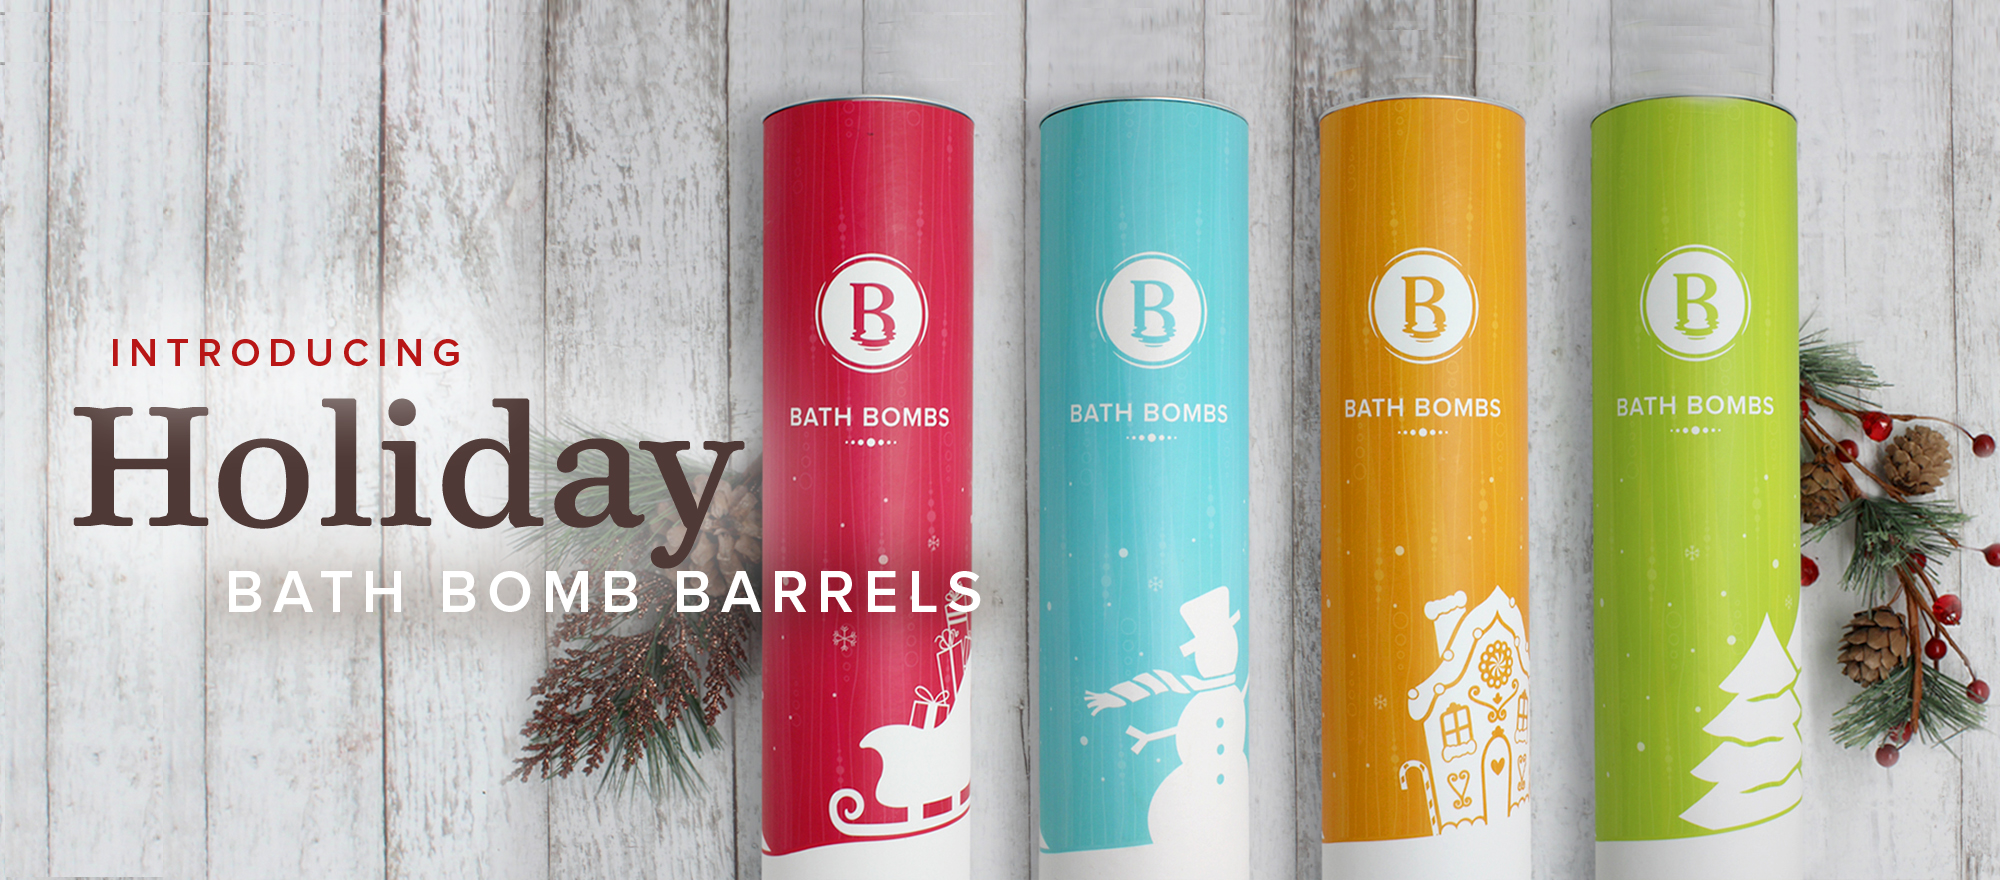 Holiday Bath Bombs